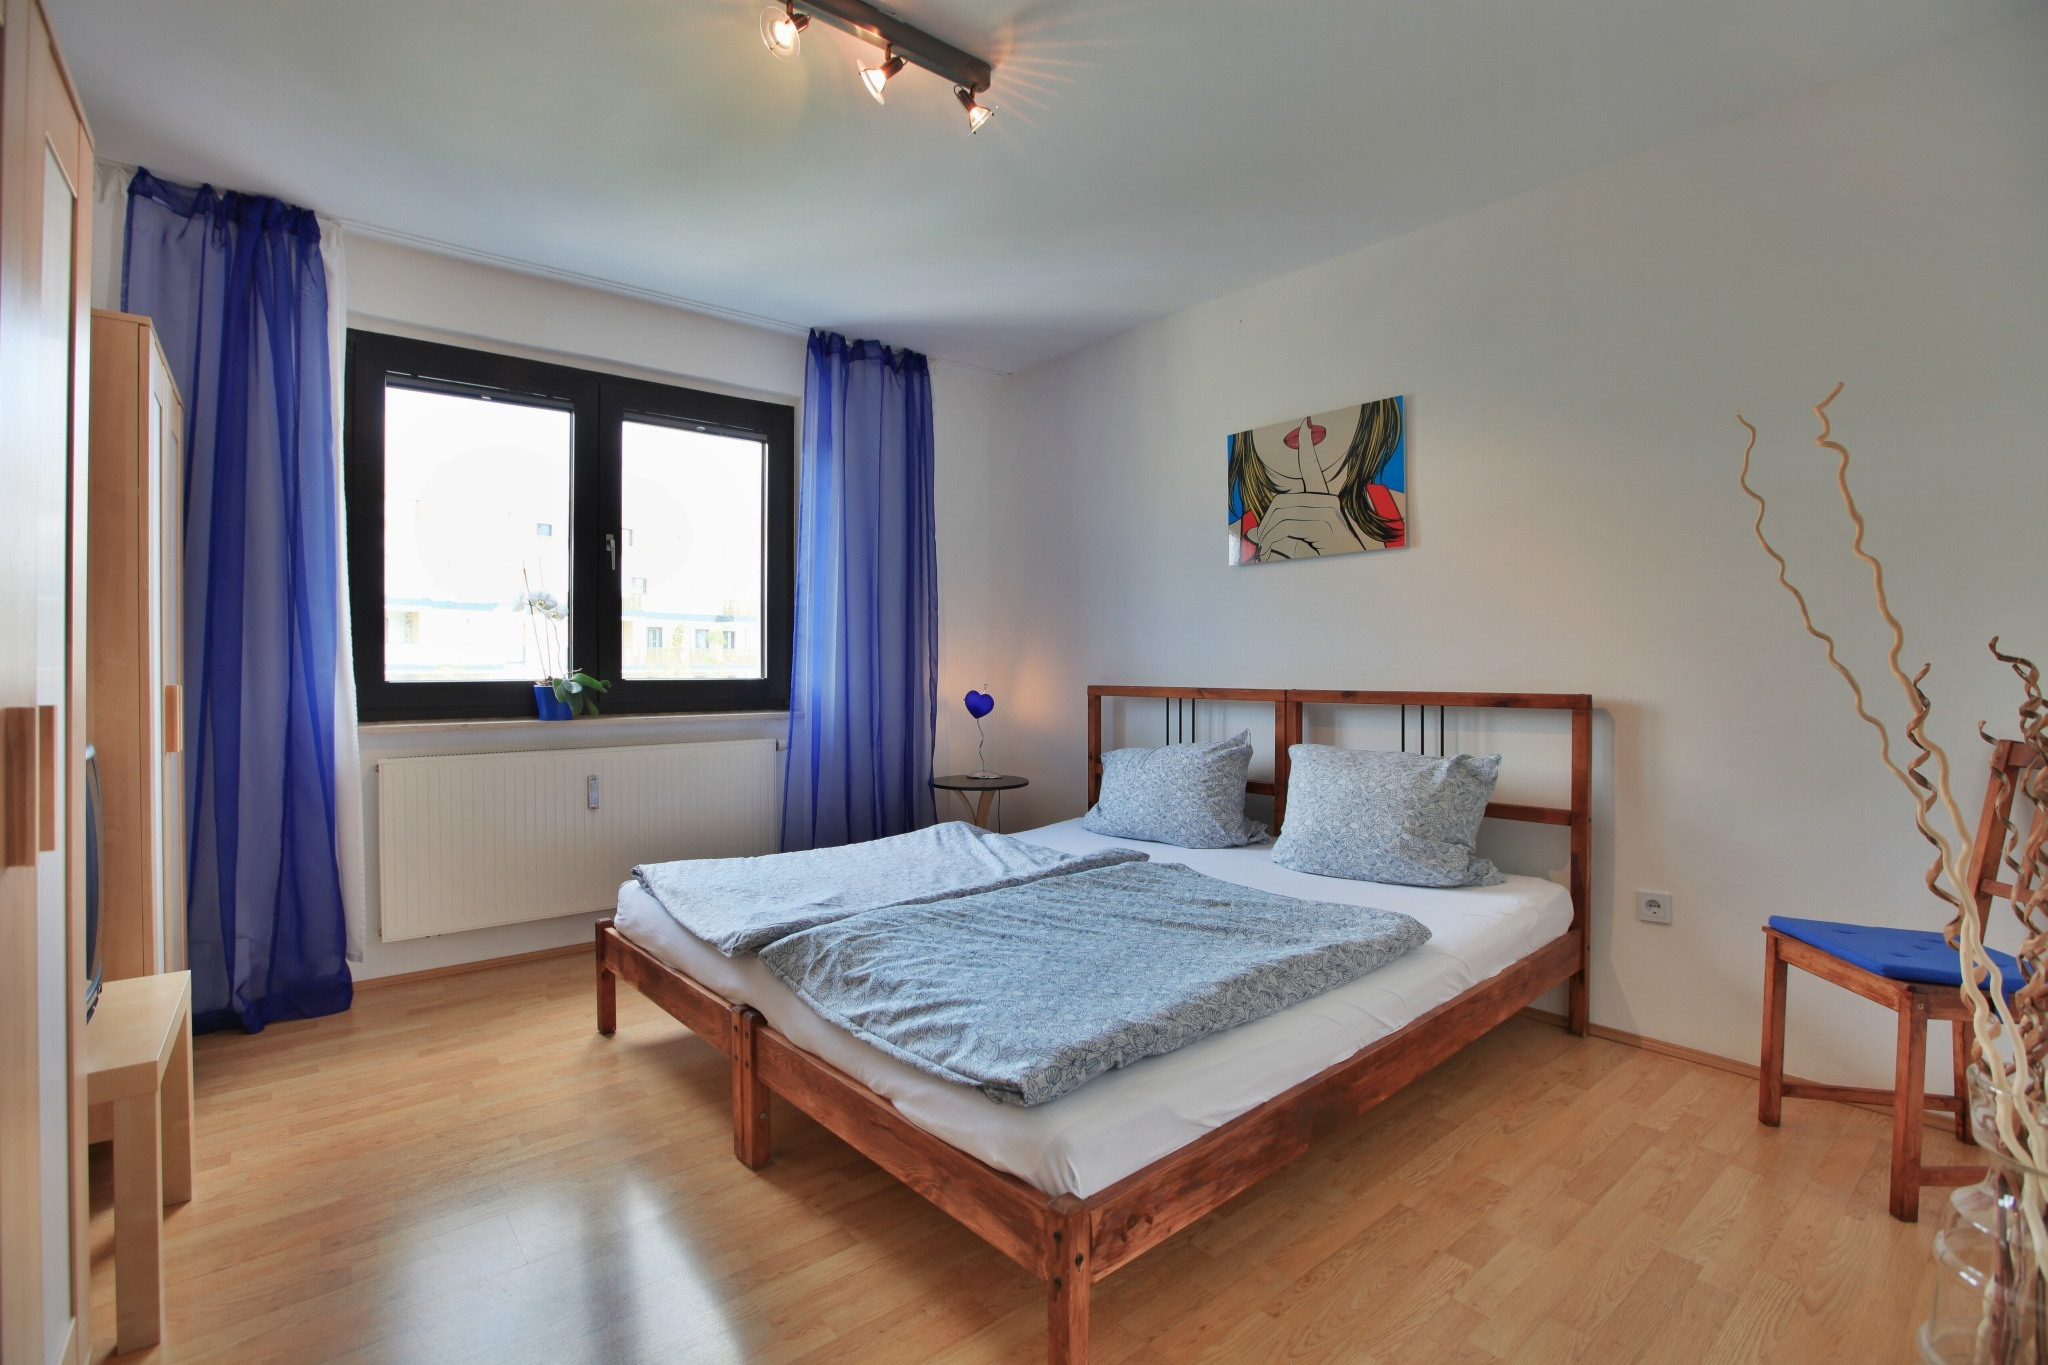 koeln appartments zollstock. Black Bedroom Furniture Sets. Home Design Ideas